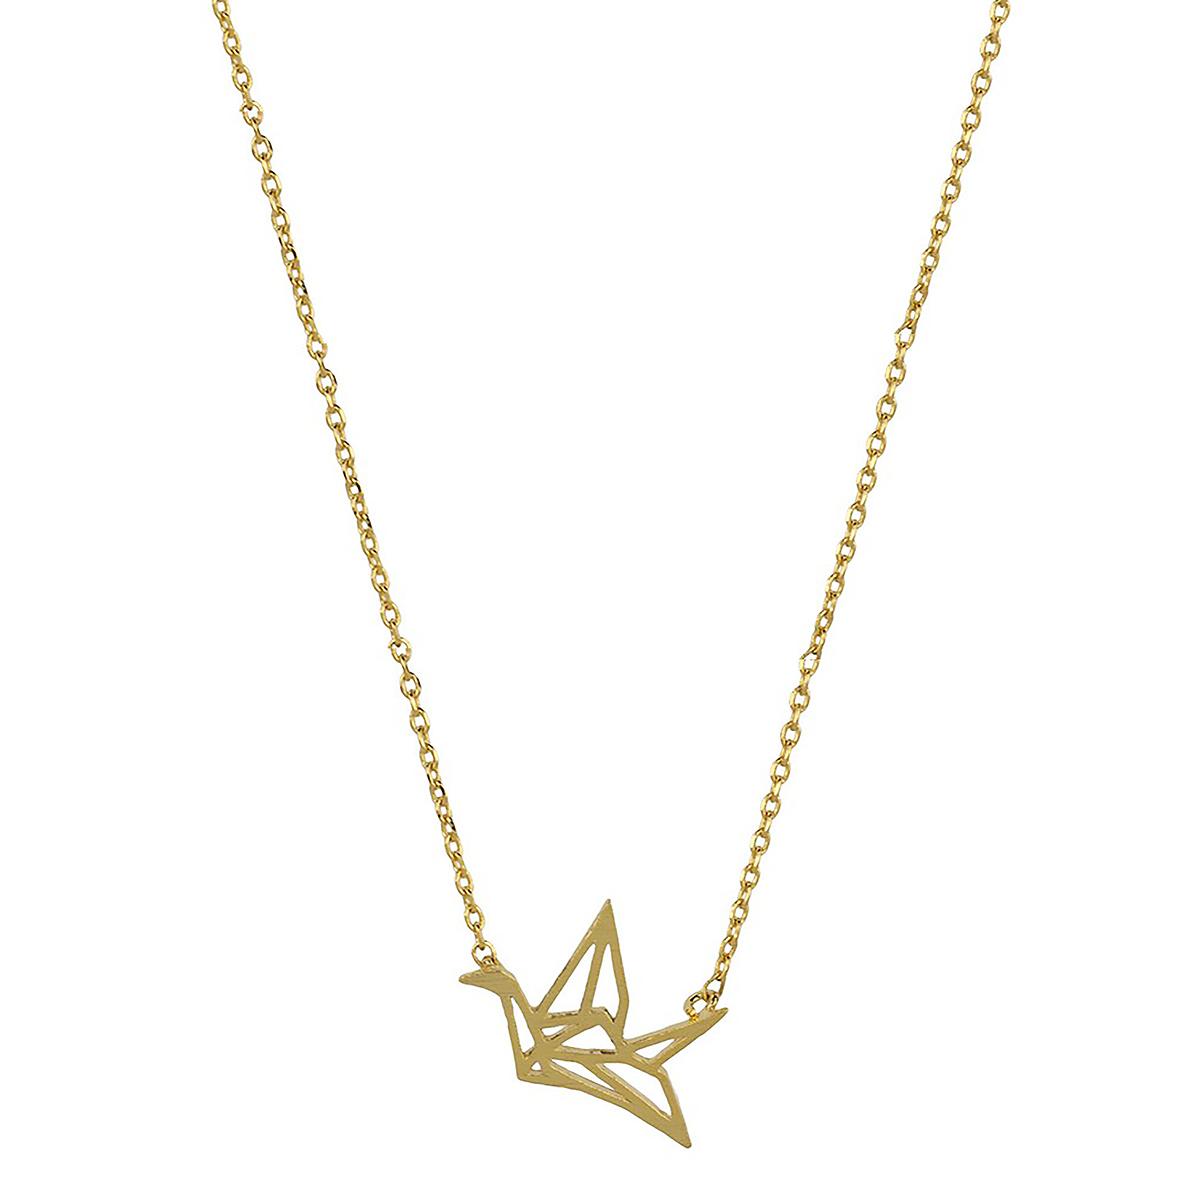 Gold bird origami necklace